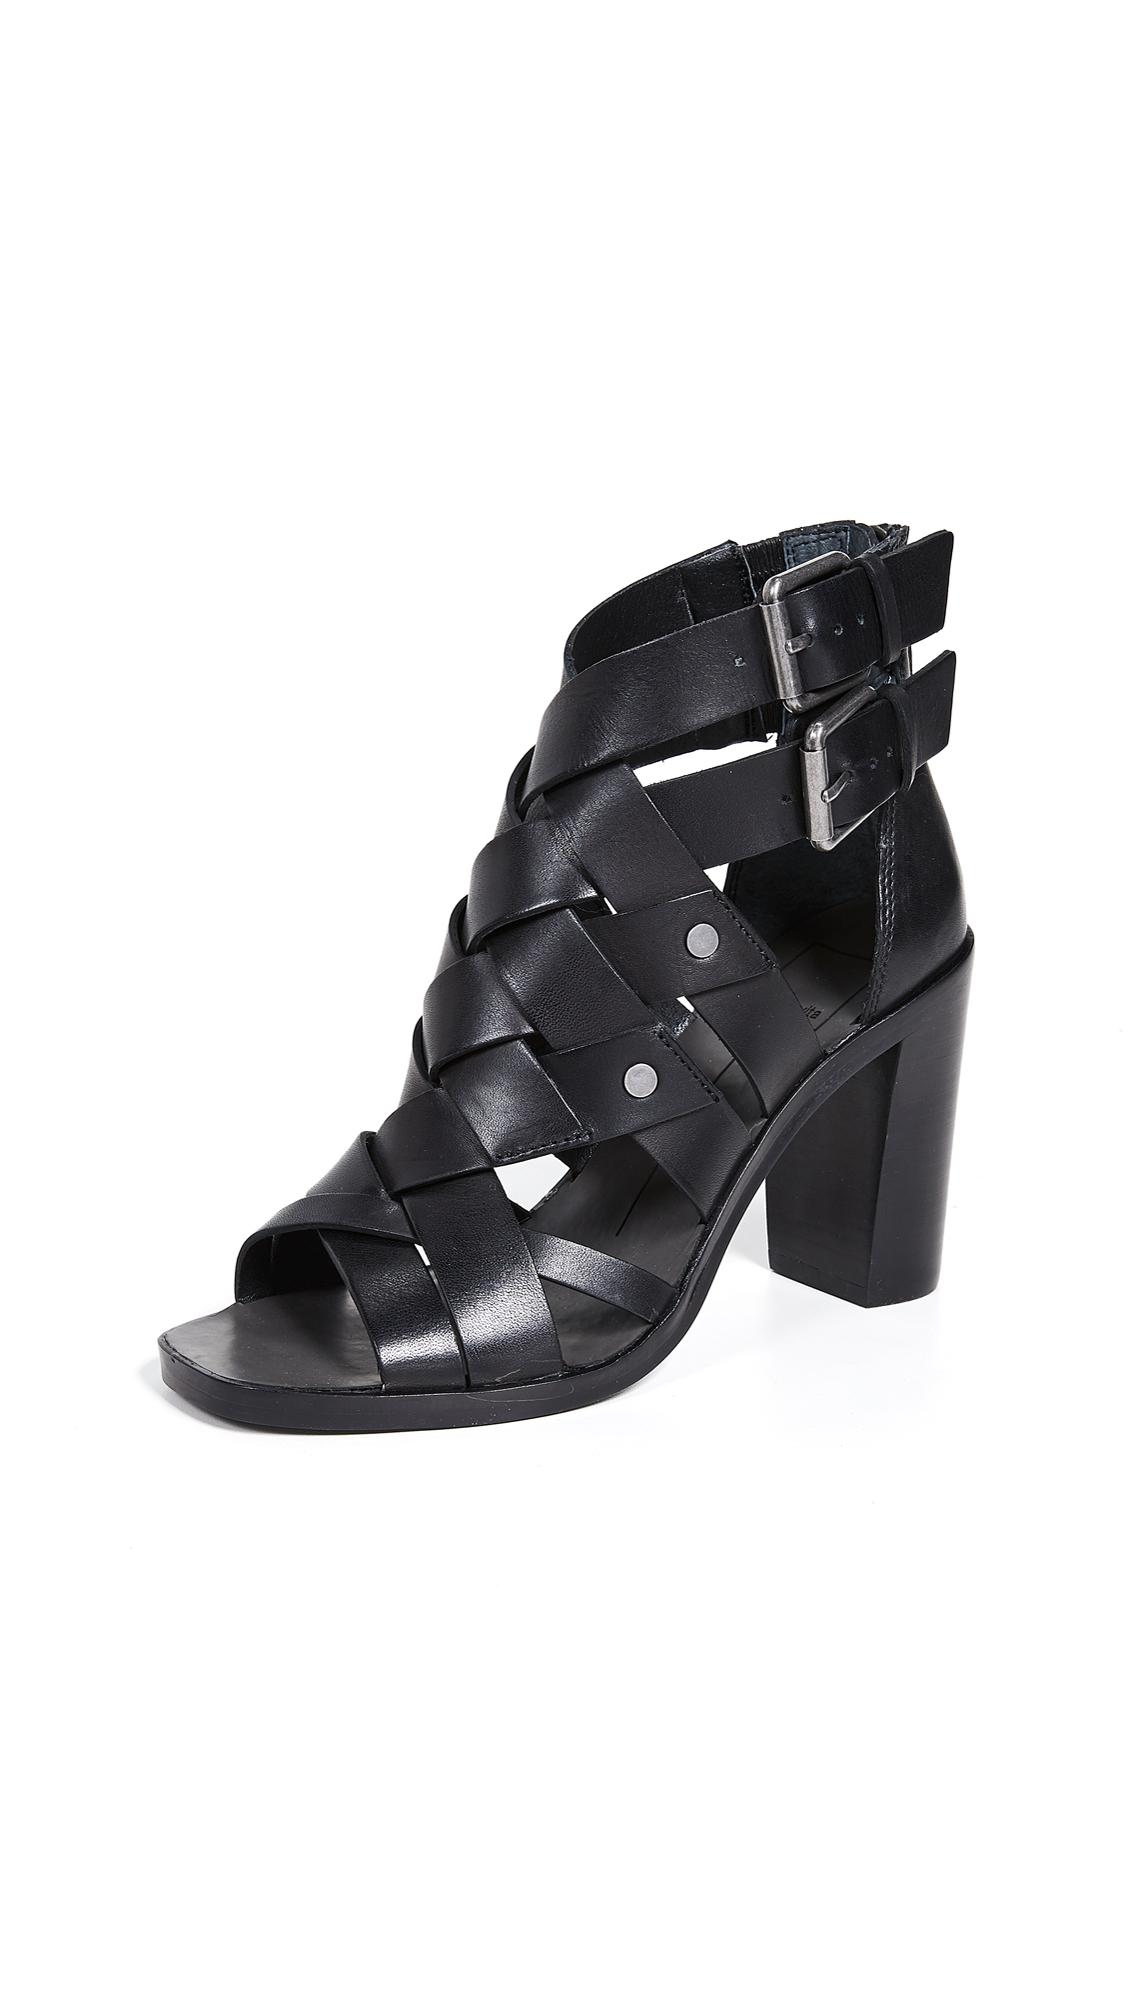 Dolce Vita Noree Peep Toe Sandals - Black